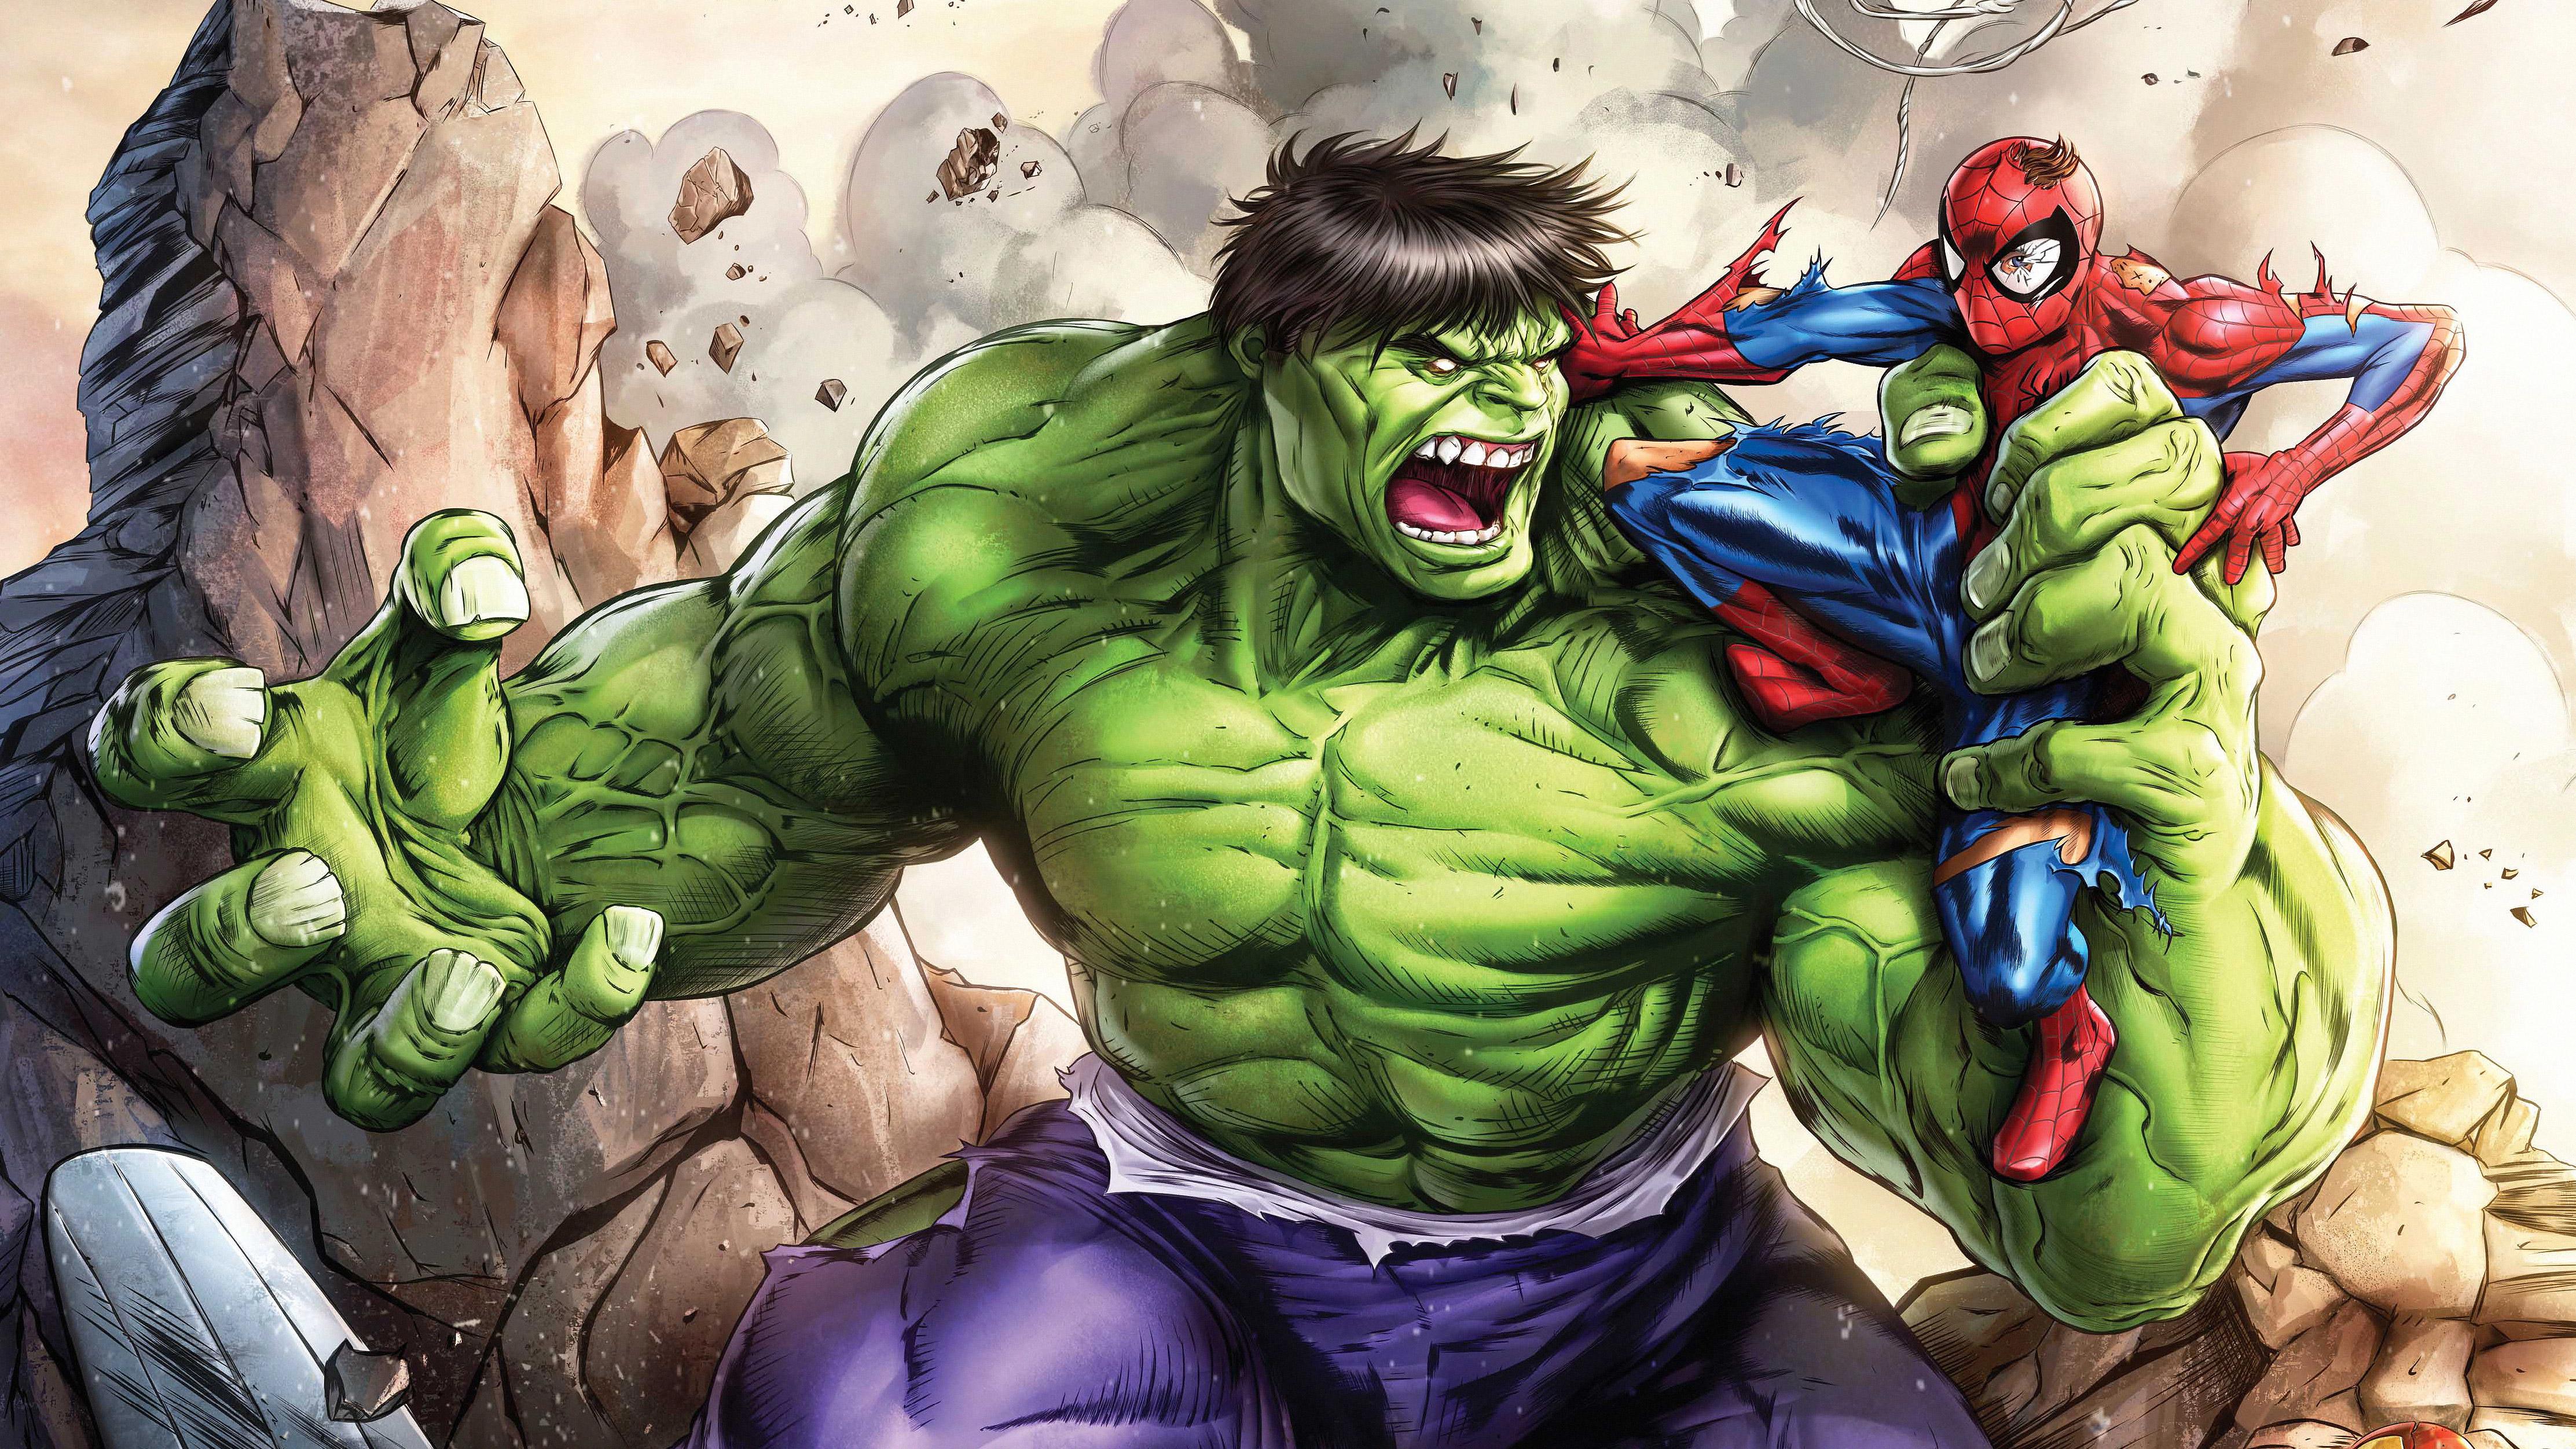 Hulk Vs Spiderman Art Wallpaper Hd Superheroes 4k